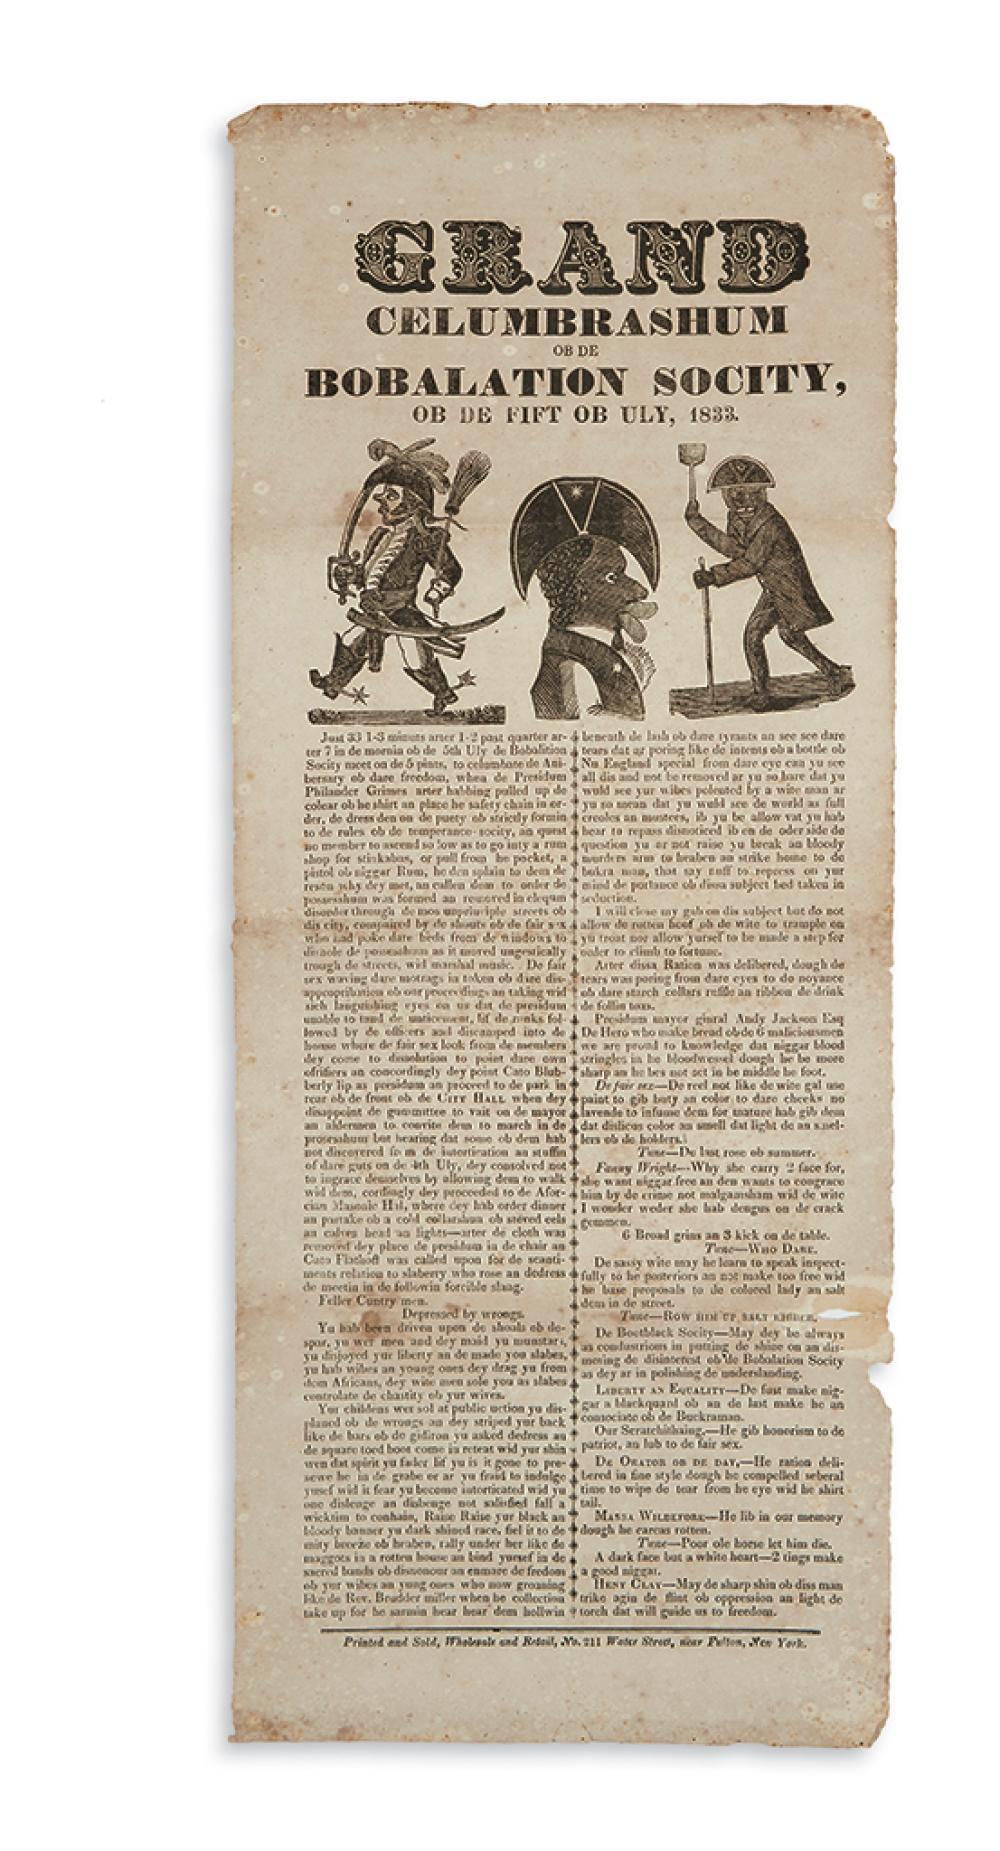 (SLAVERY AND ABOLITION.) Grand Celumbrashum ob de Bobalation Socity ob de Fift of Uly, 1833.